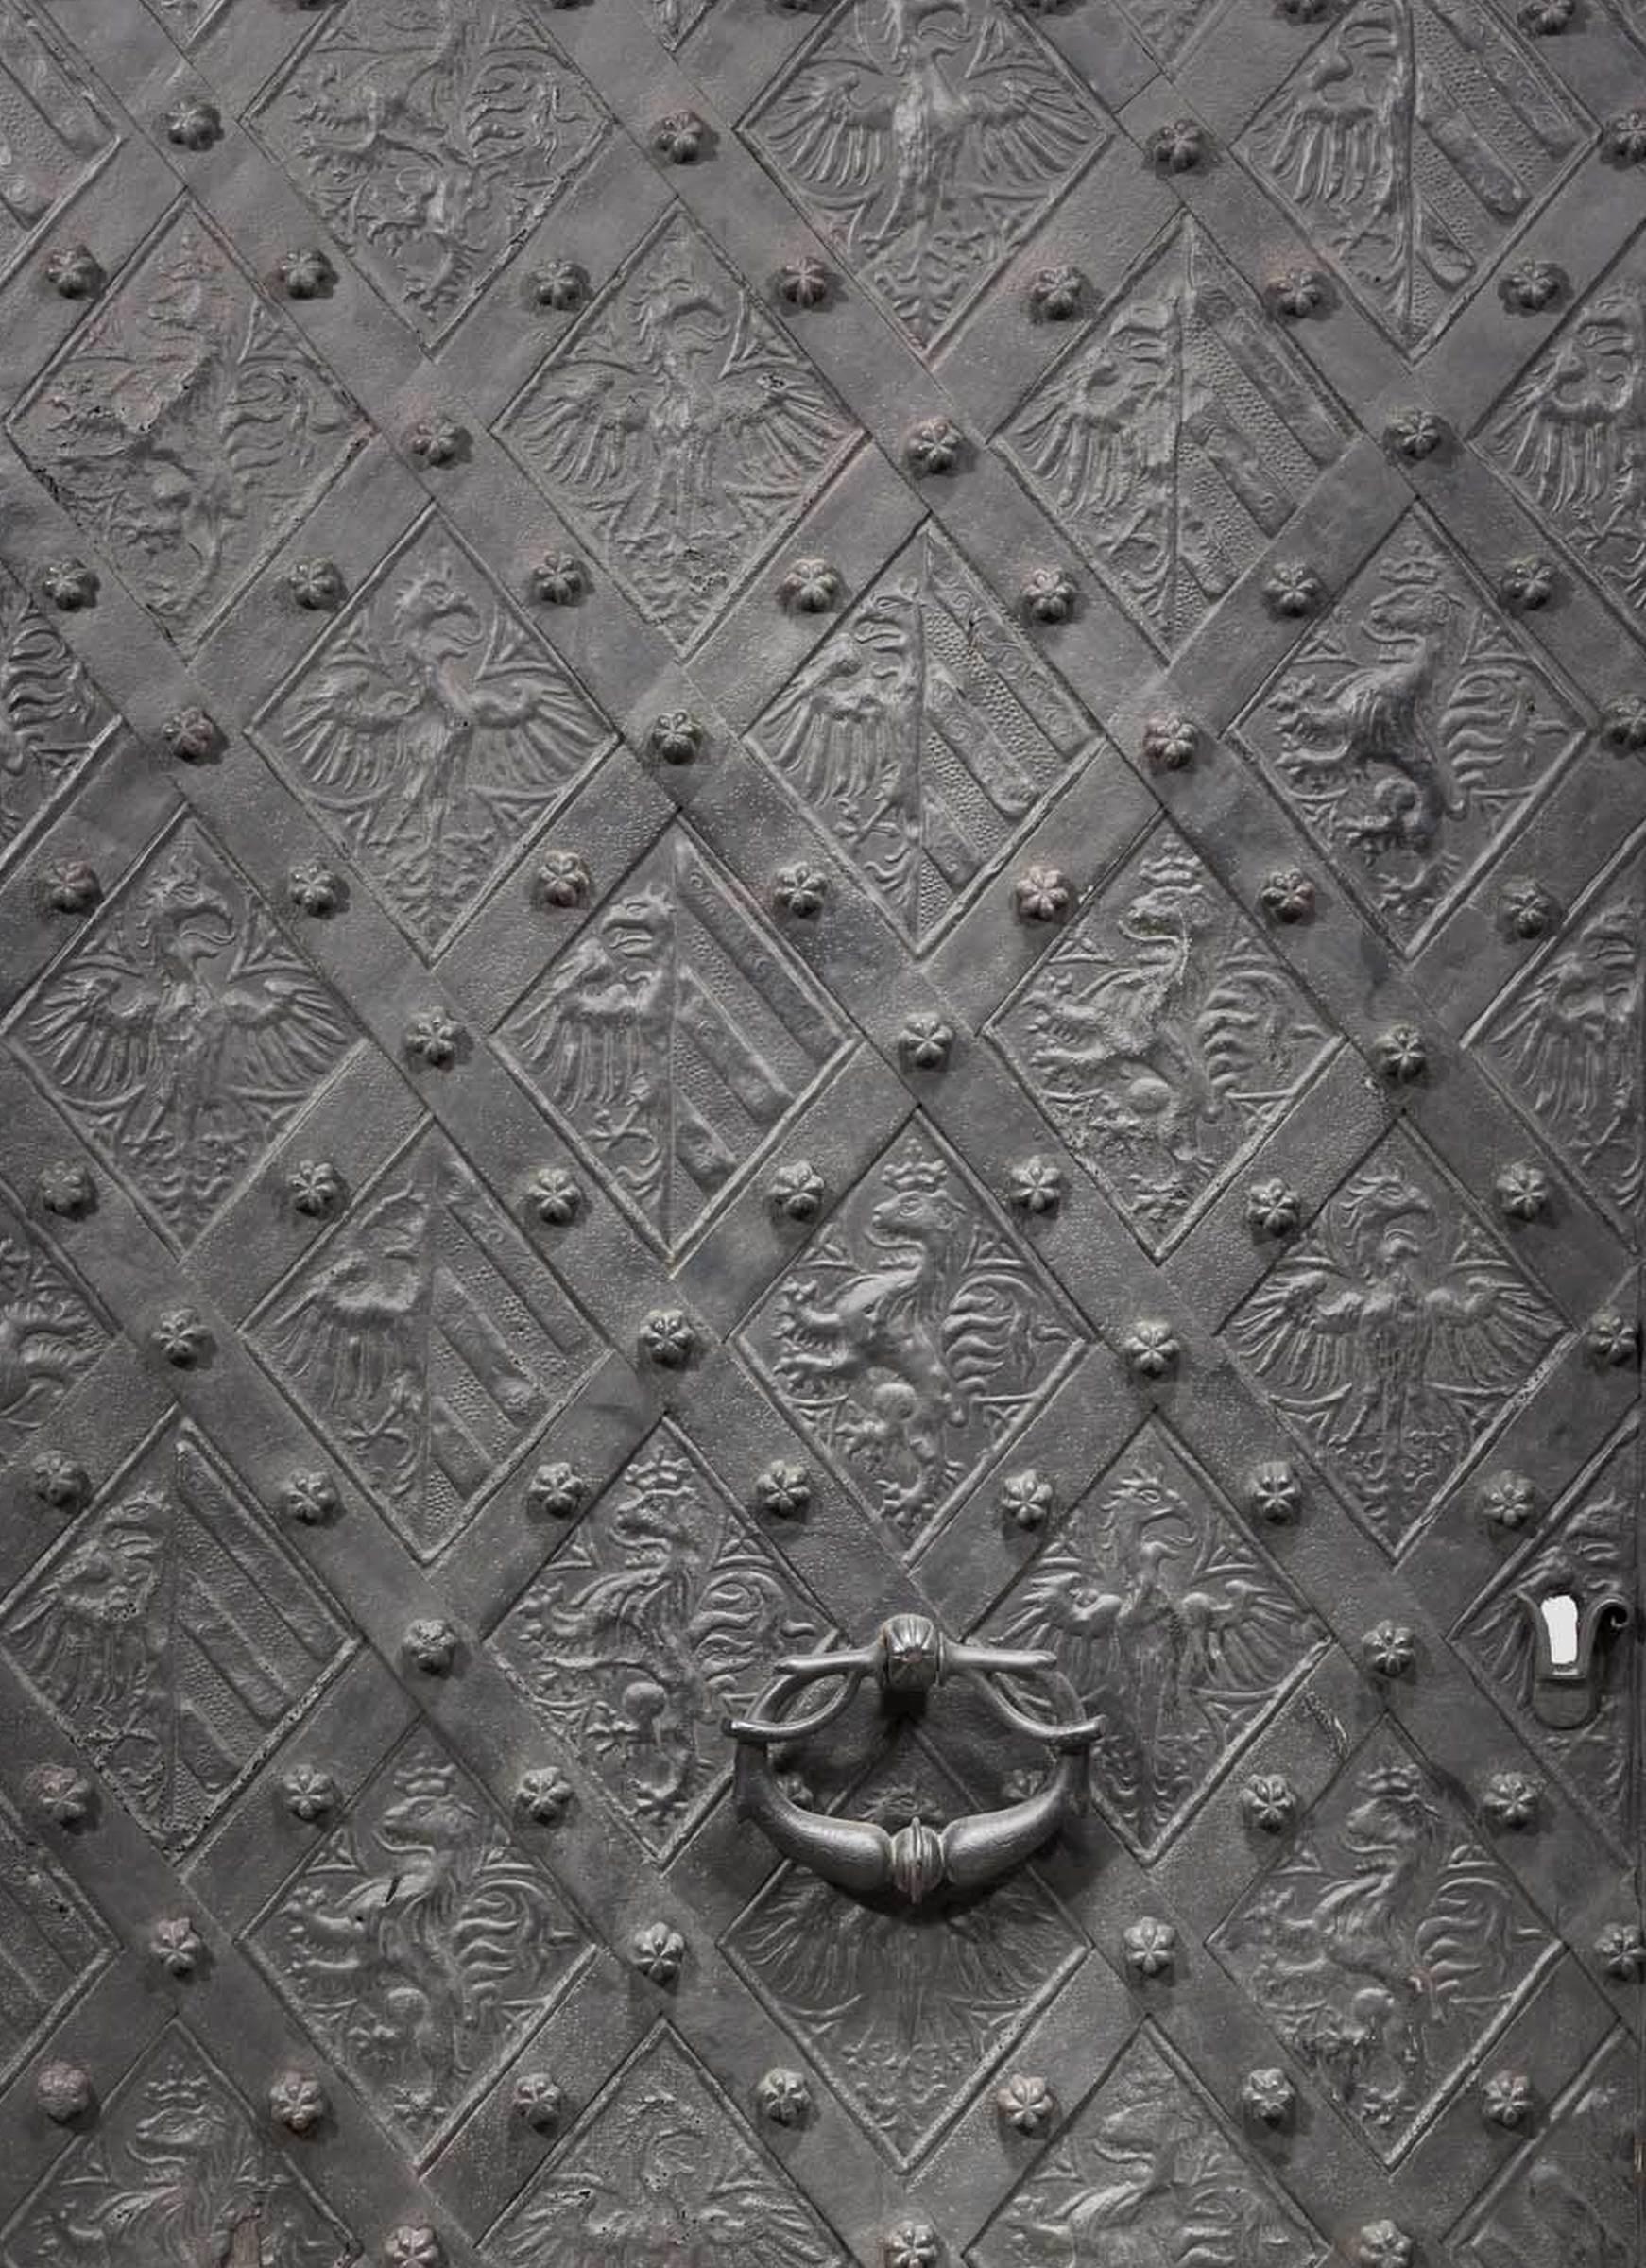 medeltiden objekt auktion